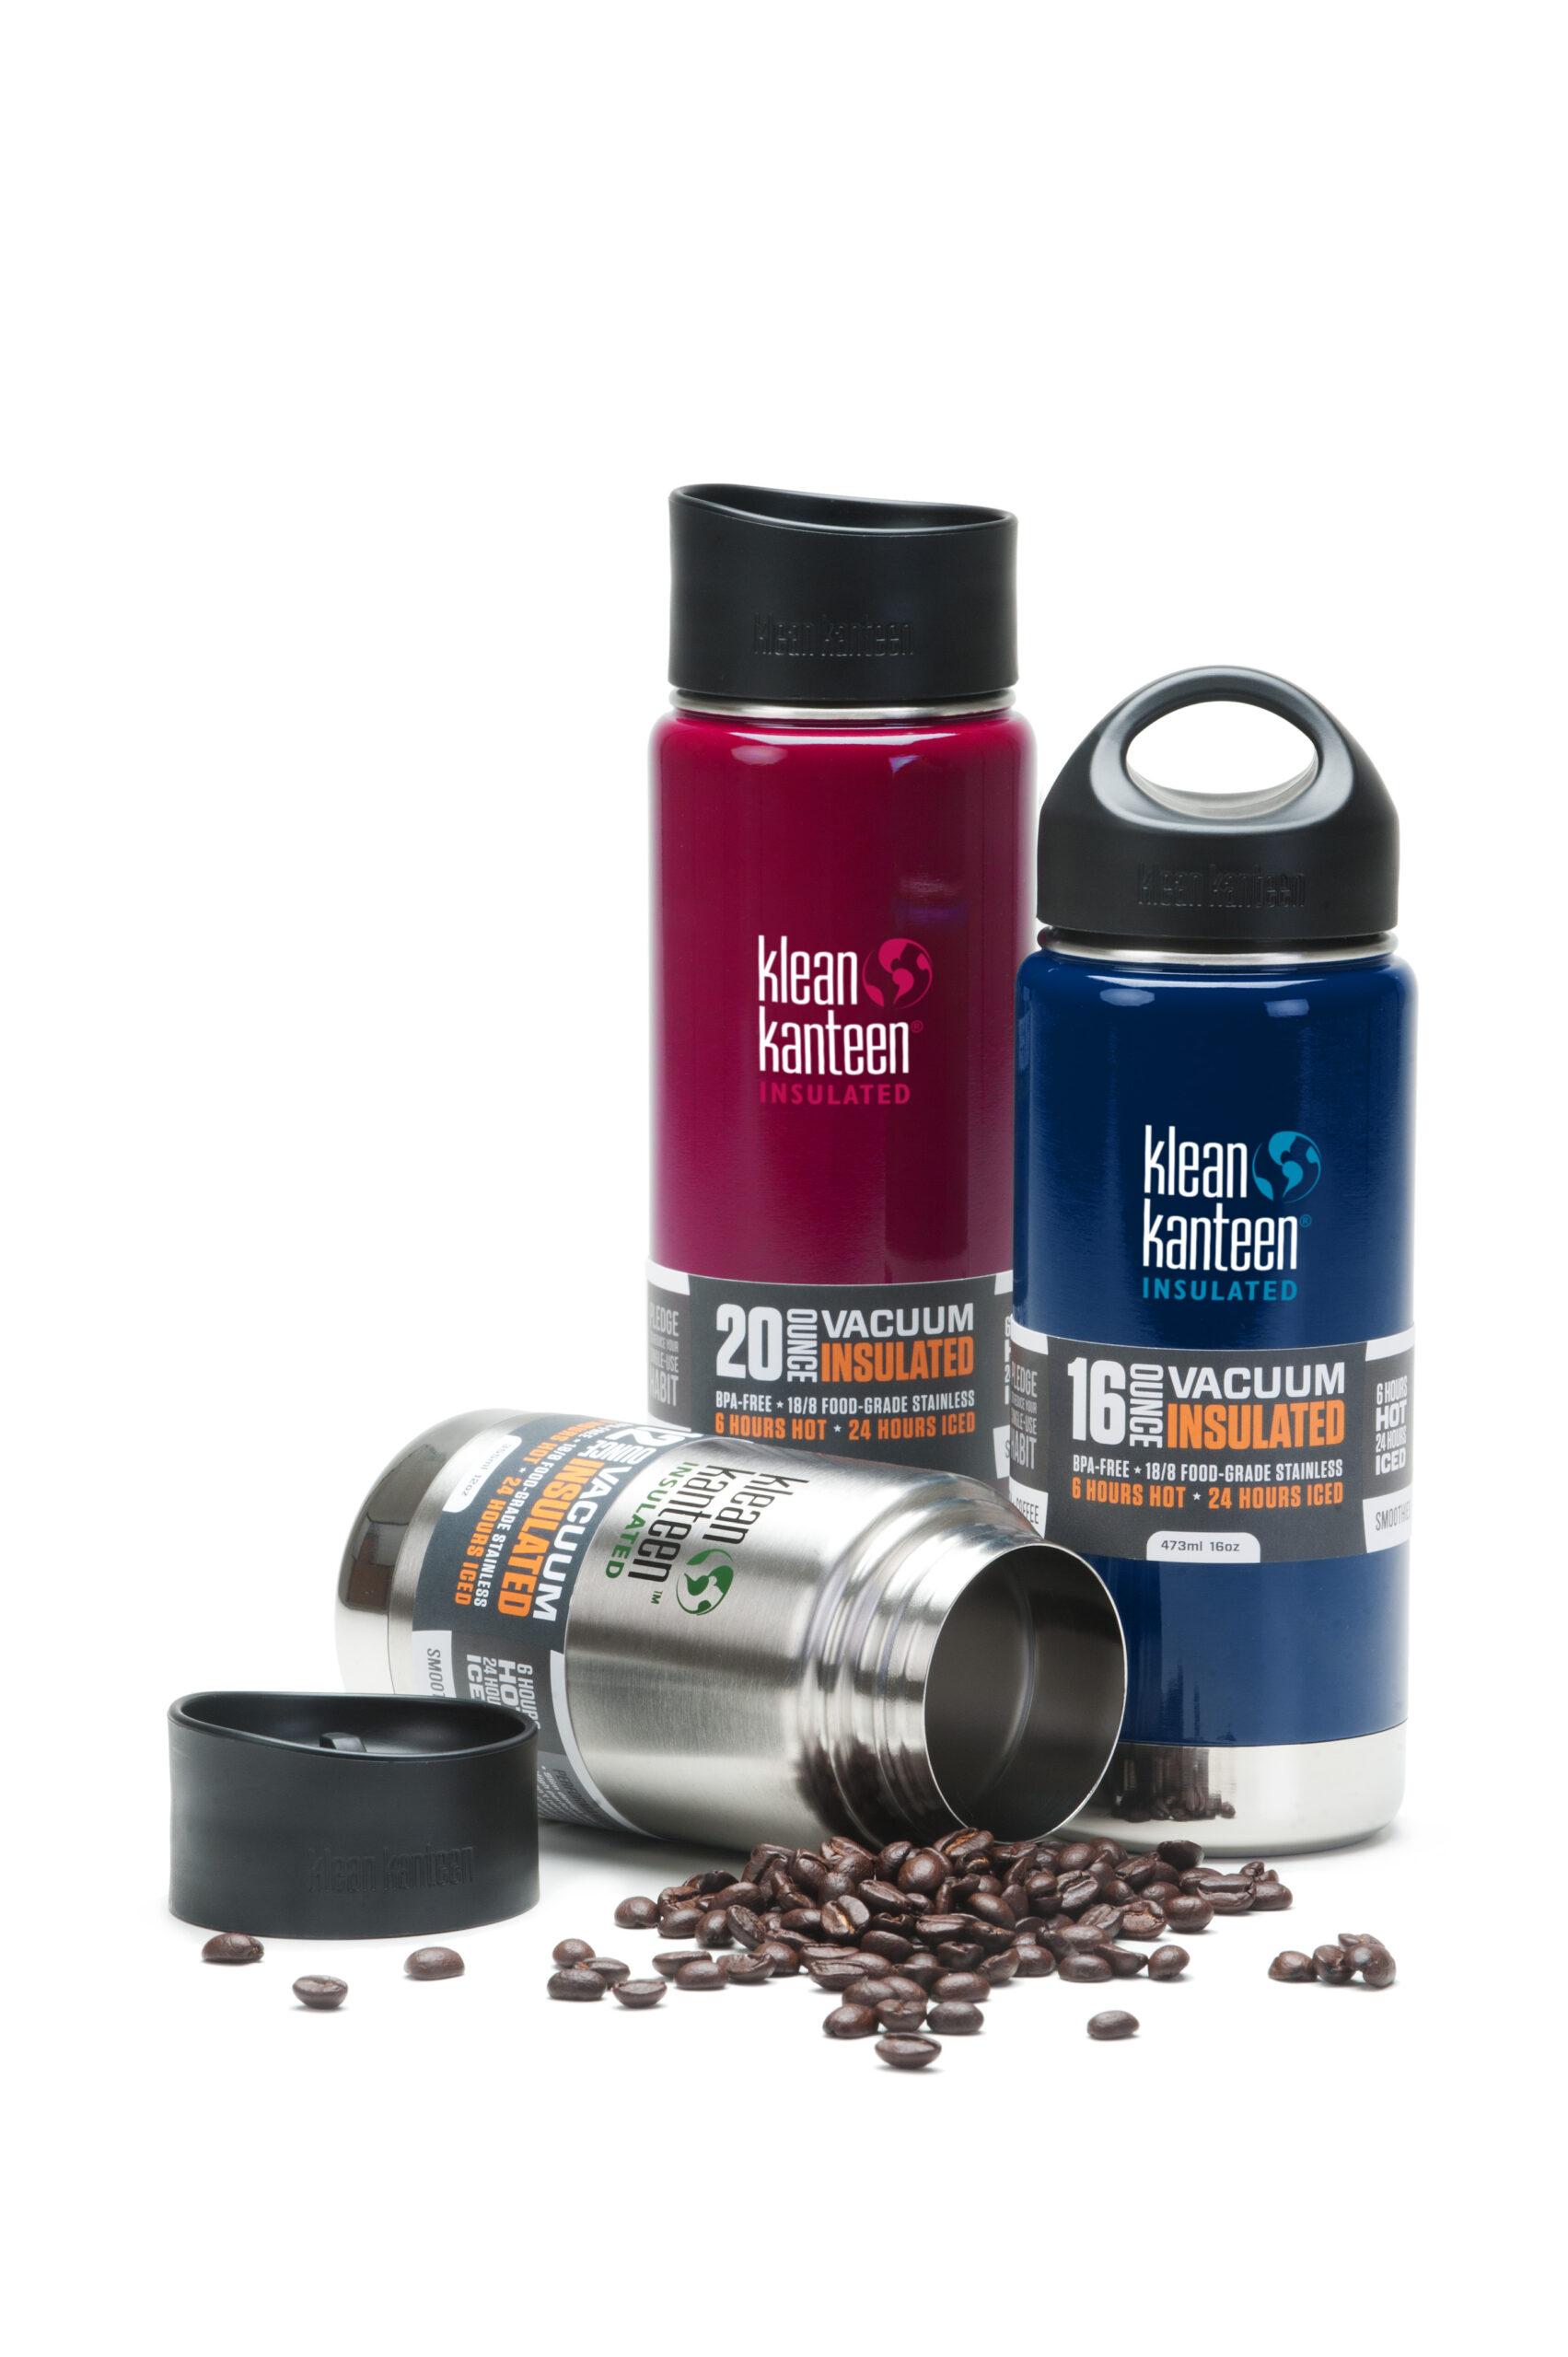 Klean Kanteen Vacuum Insulated Stainless Steel Bottle